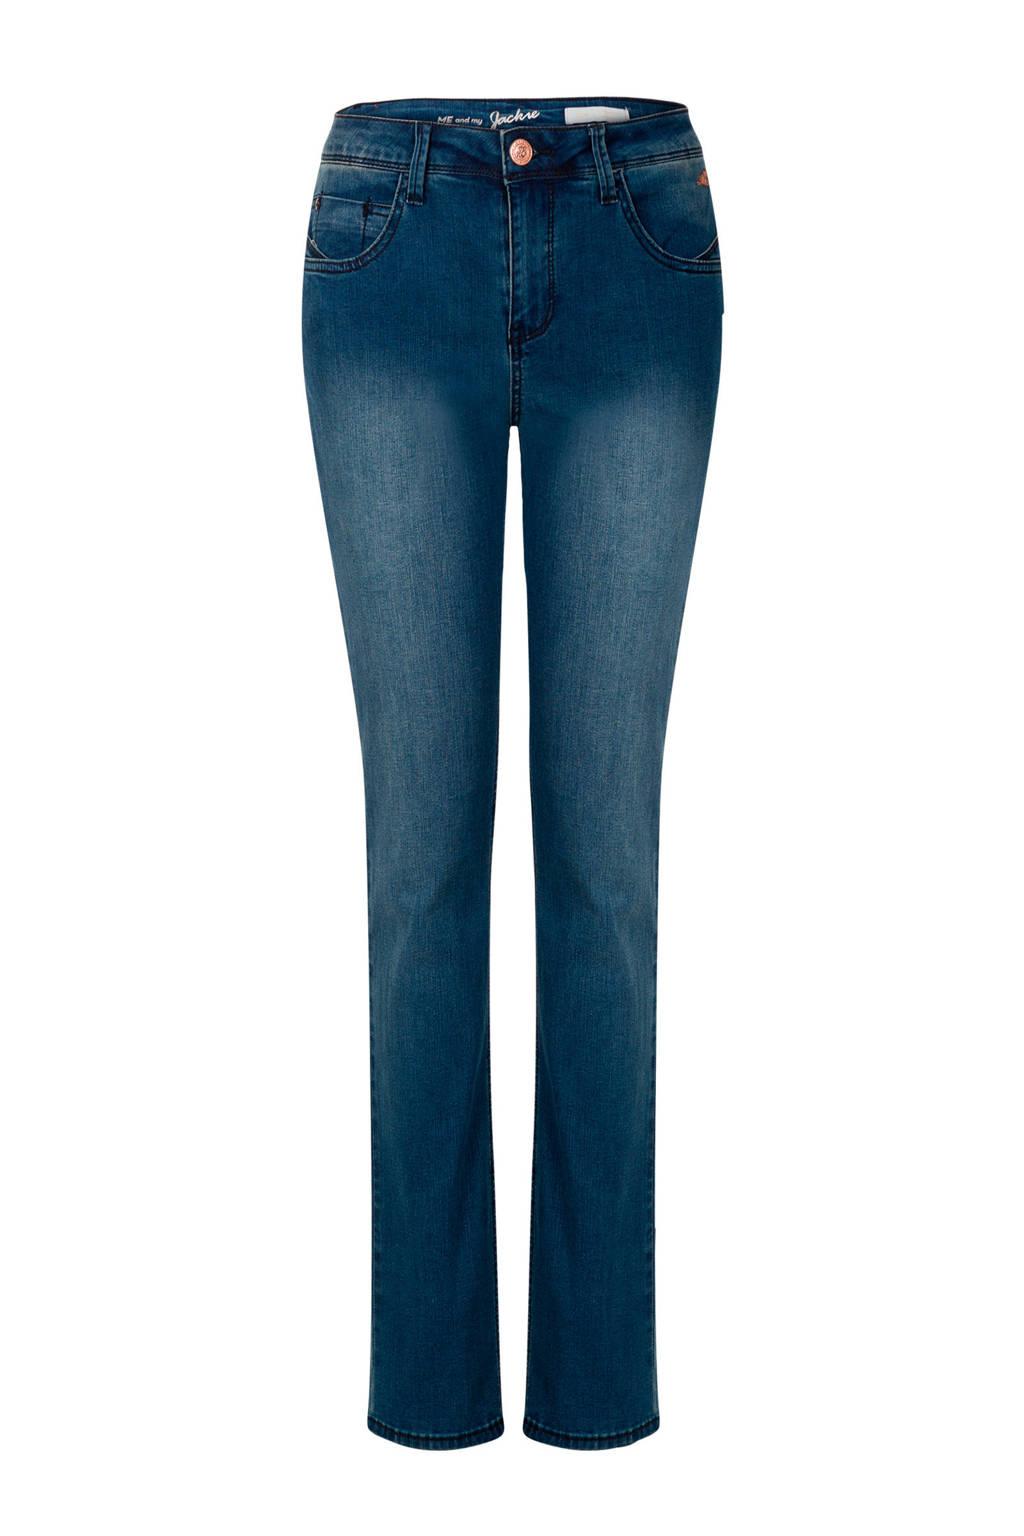 Miss Etam Regulier straight fit jeans Jackie 36 inch blauw, Blauw